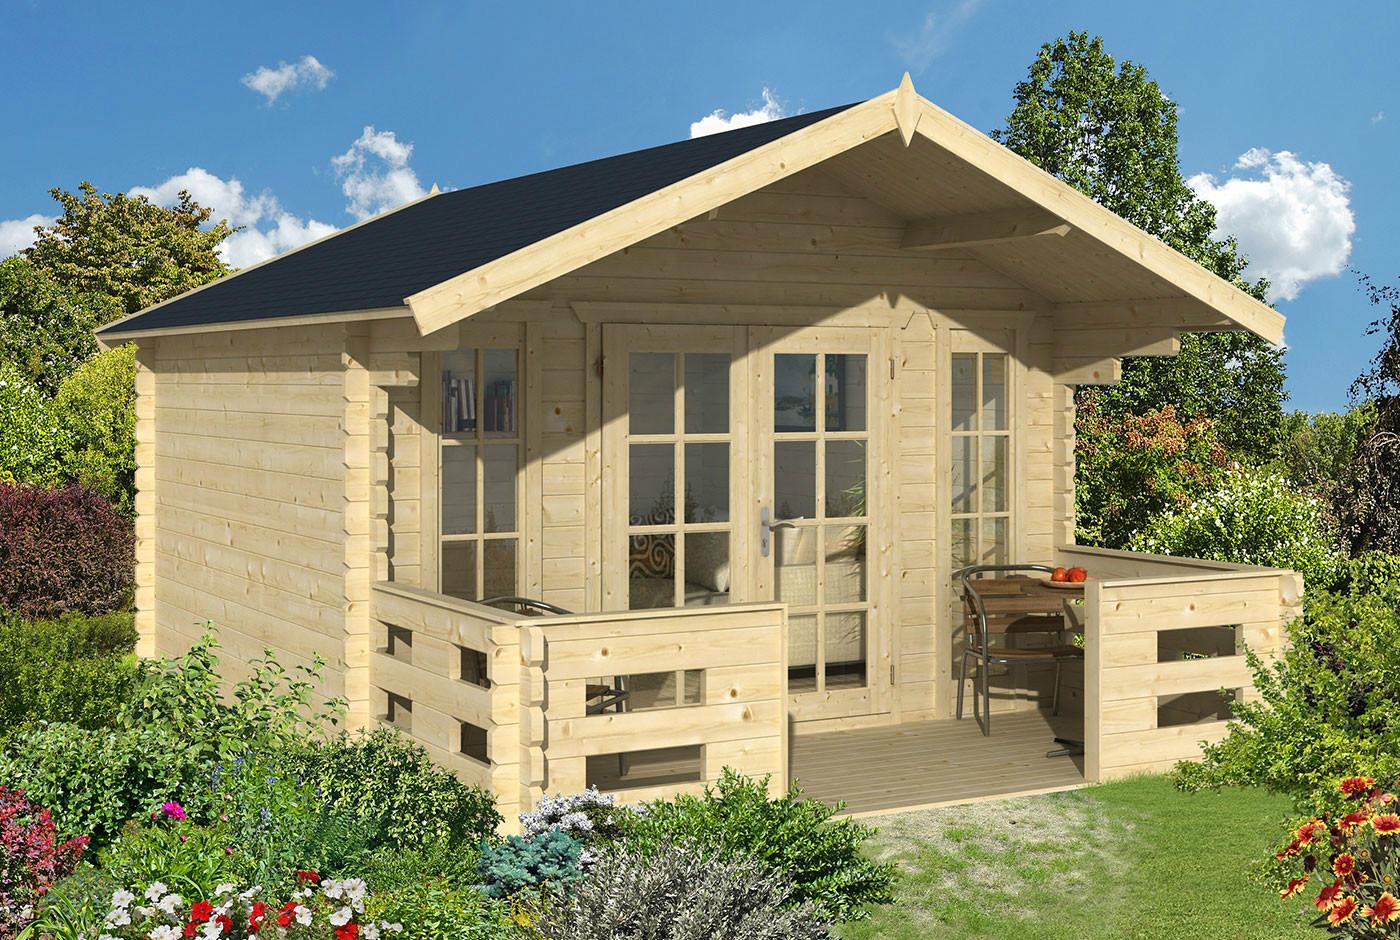 gartenhaus mit veranda lanzarote